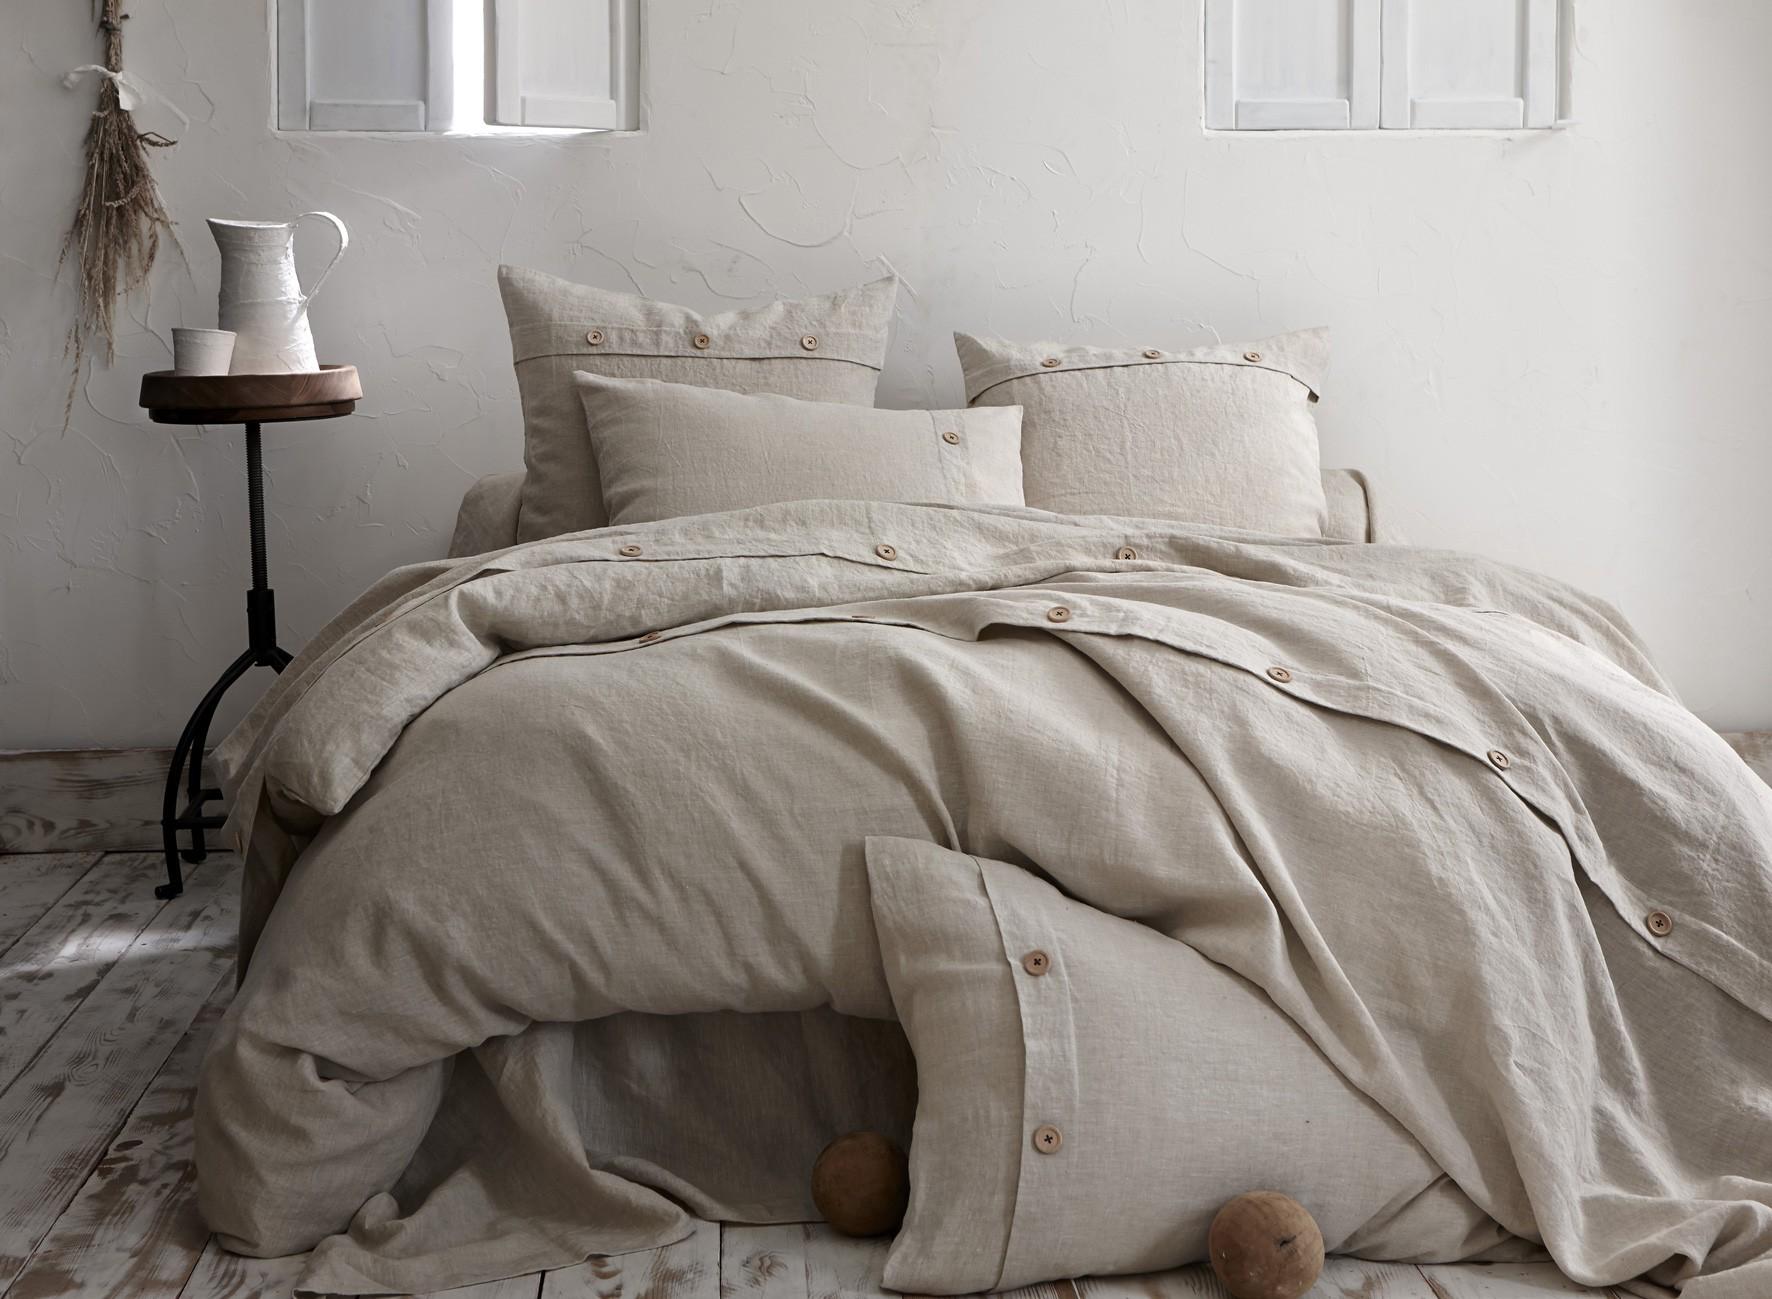 taie de traversin lin naturel taille 86x185cm. Black Bedroom Furniture Sets. Home Design Ideas